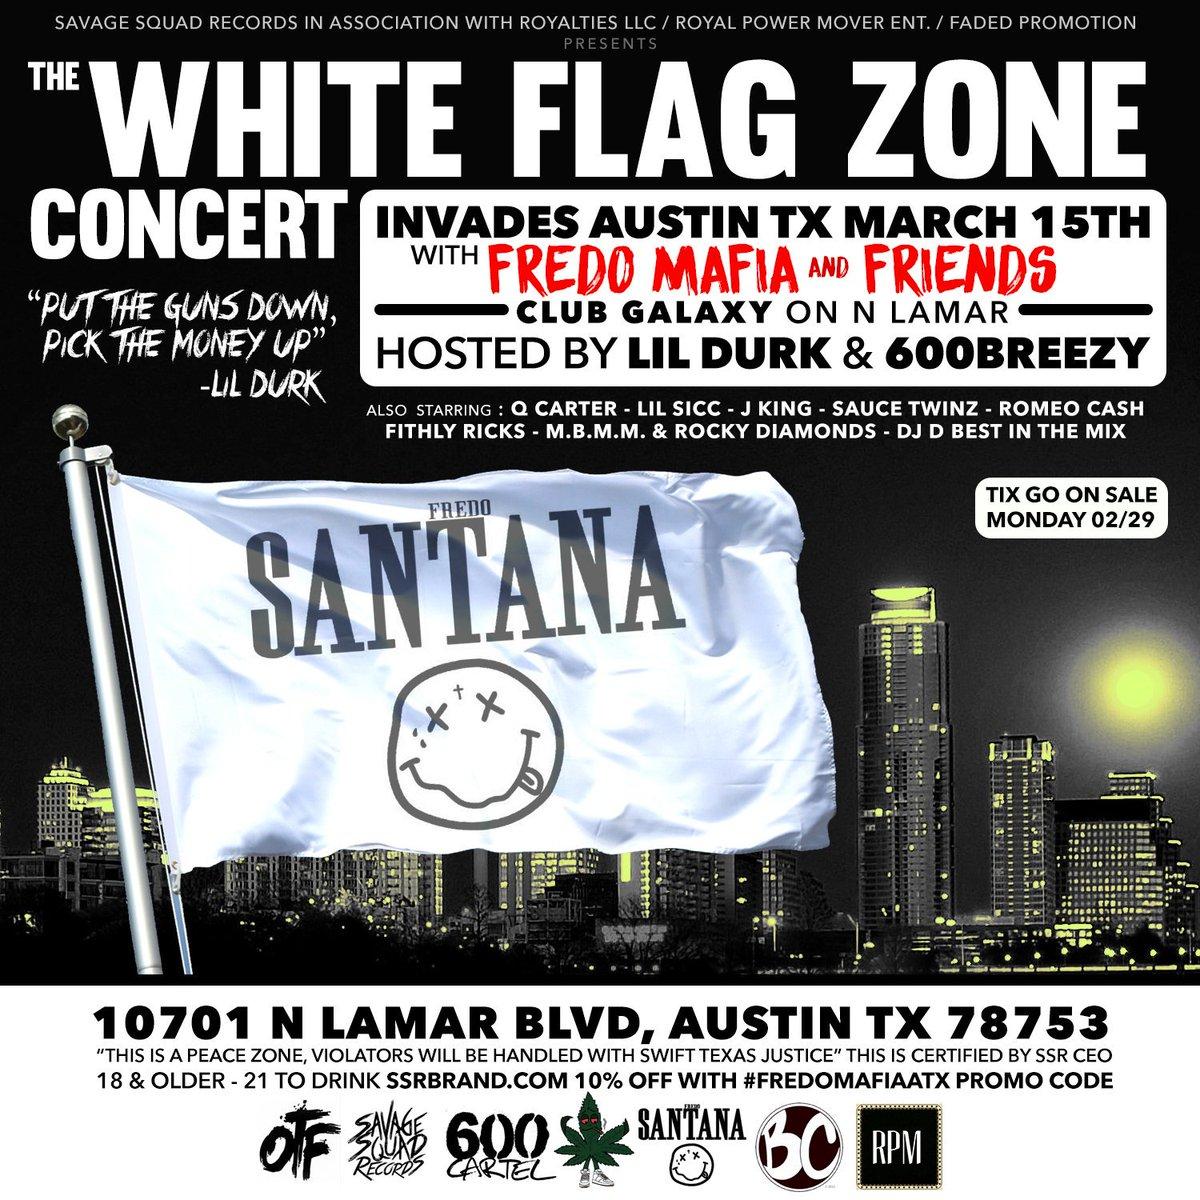 03/15  @FREDOSANTANA300 will Headline #SXSW KICK OFF WHITE FLAG ZONE CONCERT HOSTED BY @600Breezy & @lildurk_  atx!! https://t.co/KQtGLQhkNO